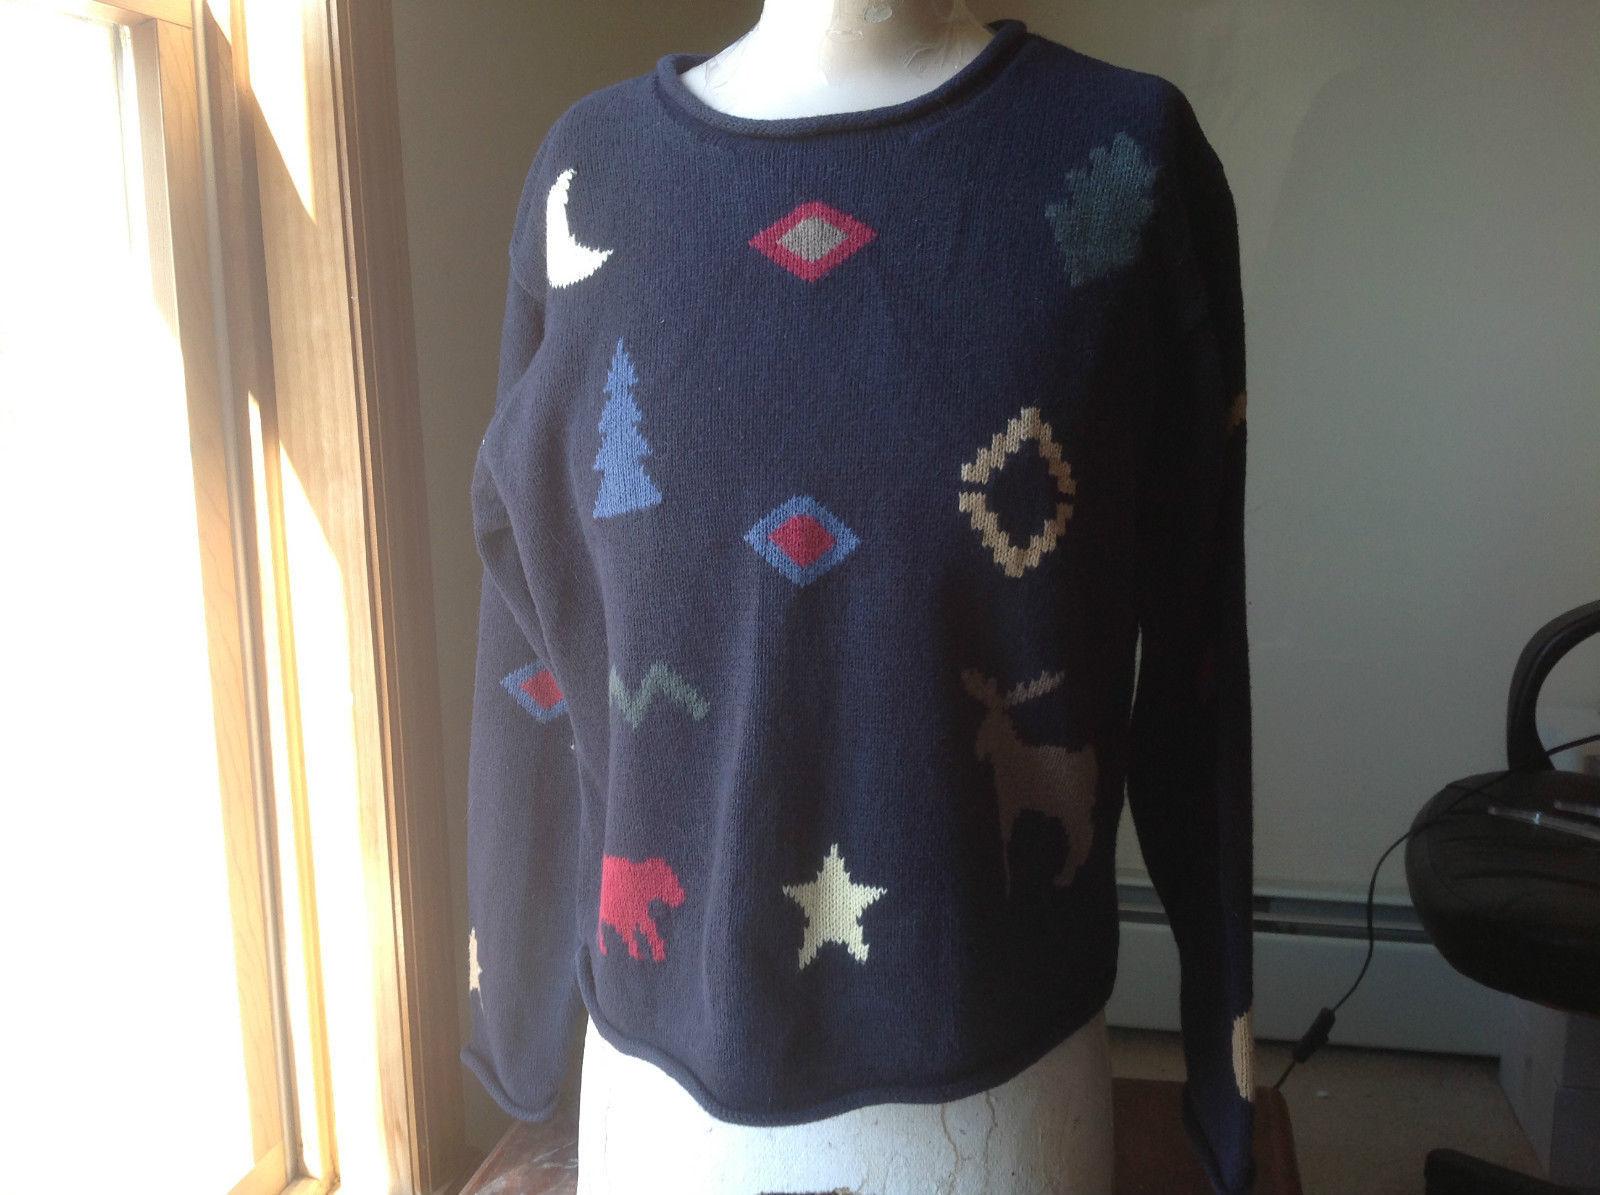 Christoper & Banks Dark Blue Patterned Knit Sweater Rolled Seams Size Medium